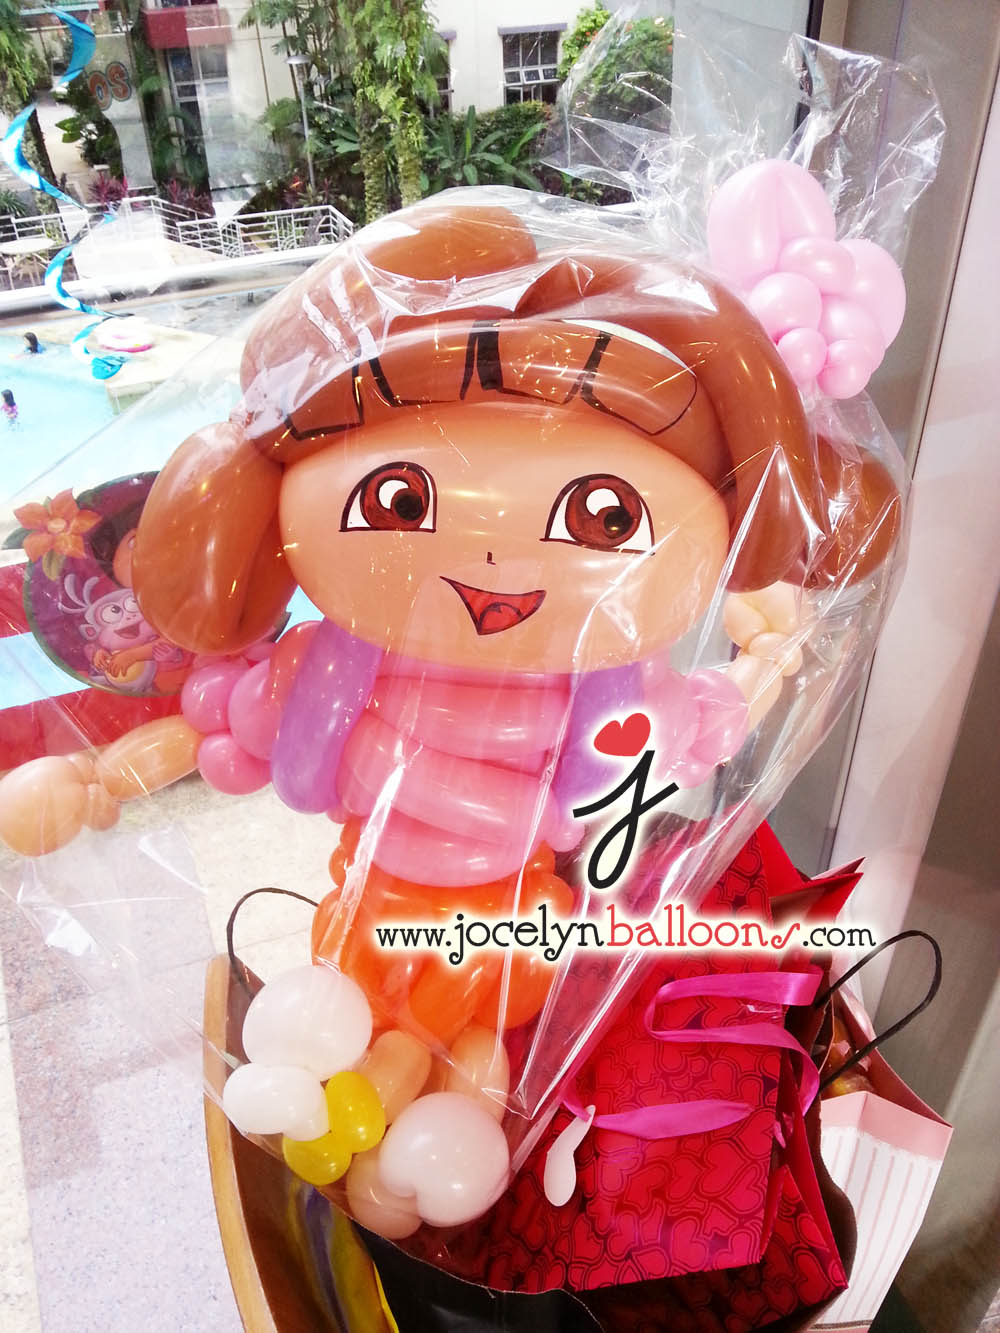 Jocelyn Ng Professional Balloon Artist Blog Balloon Sculpting